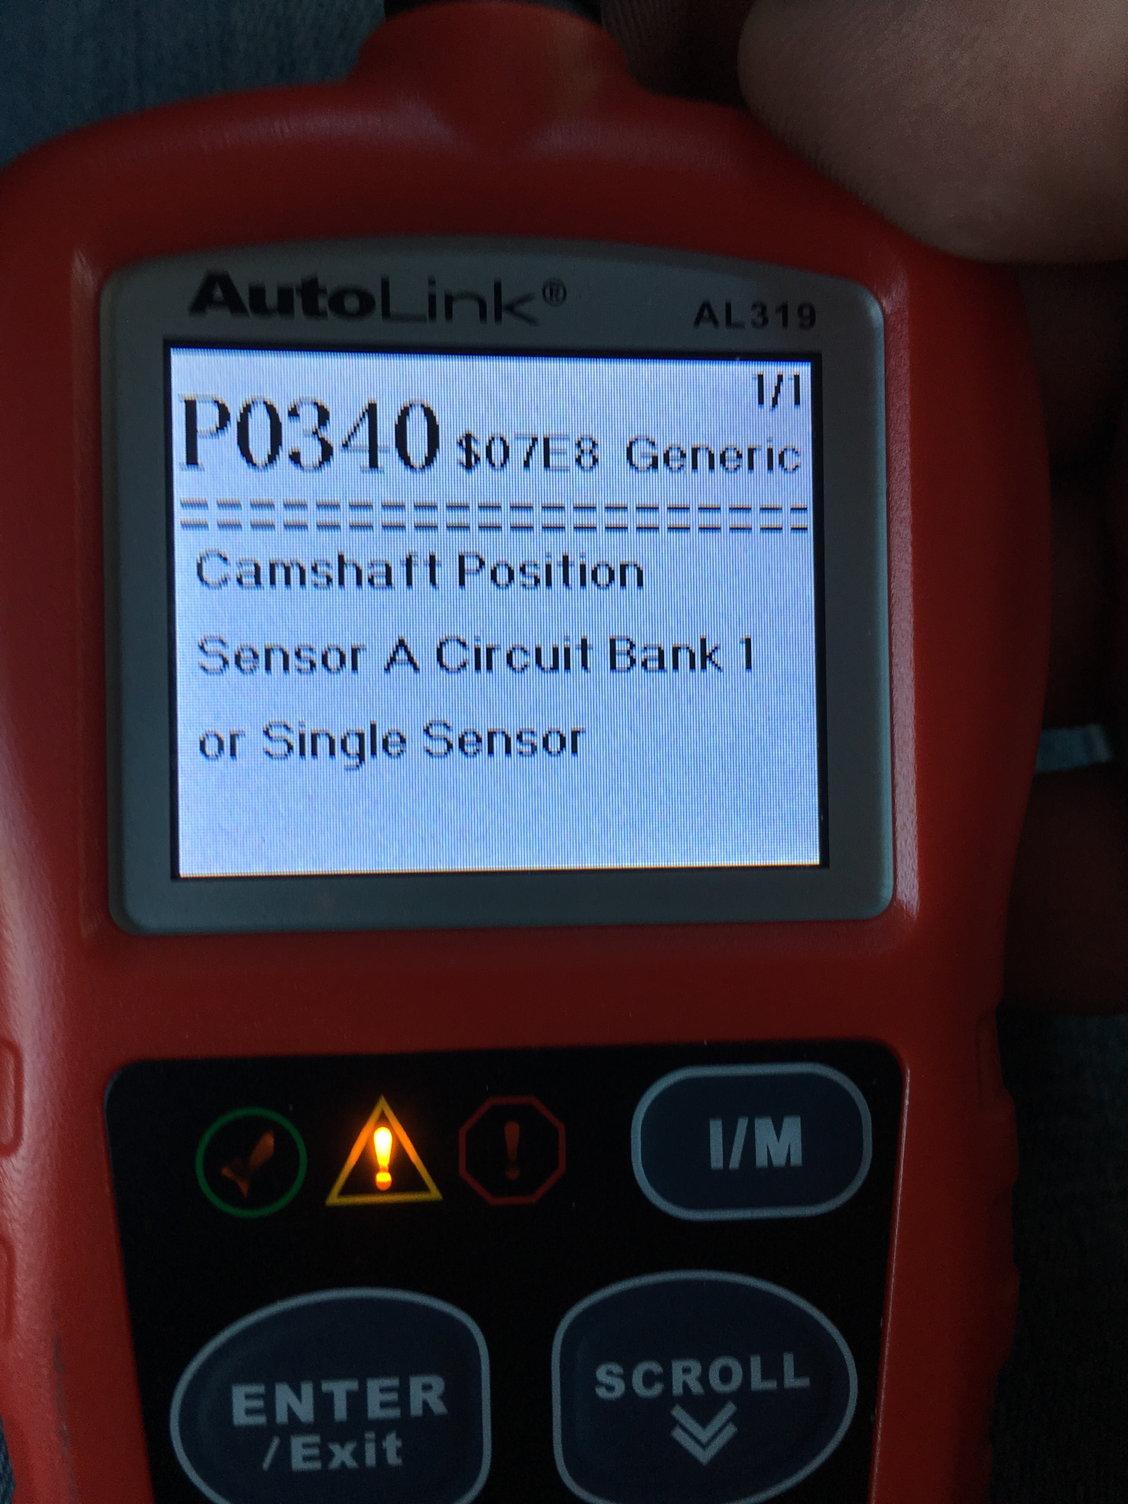 p0012 intake camshaft position timing - over-retarded (bank 1)